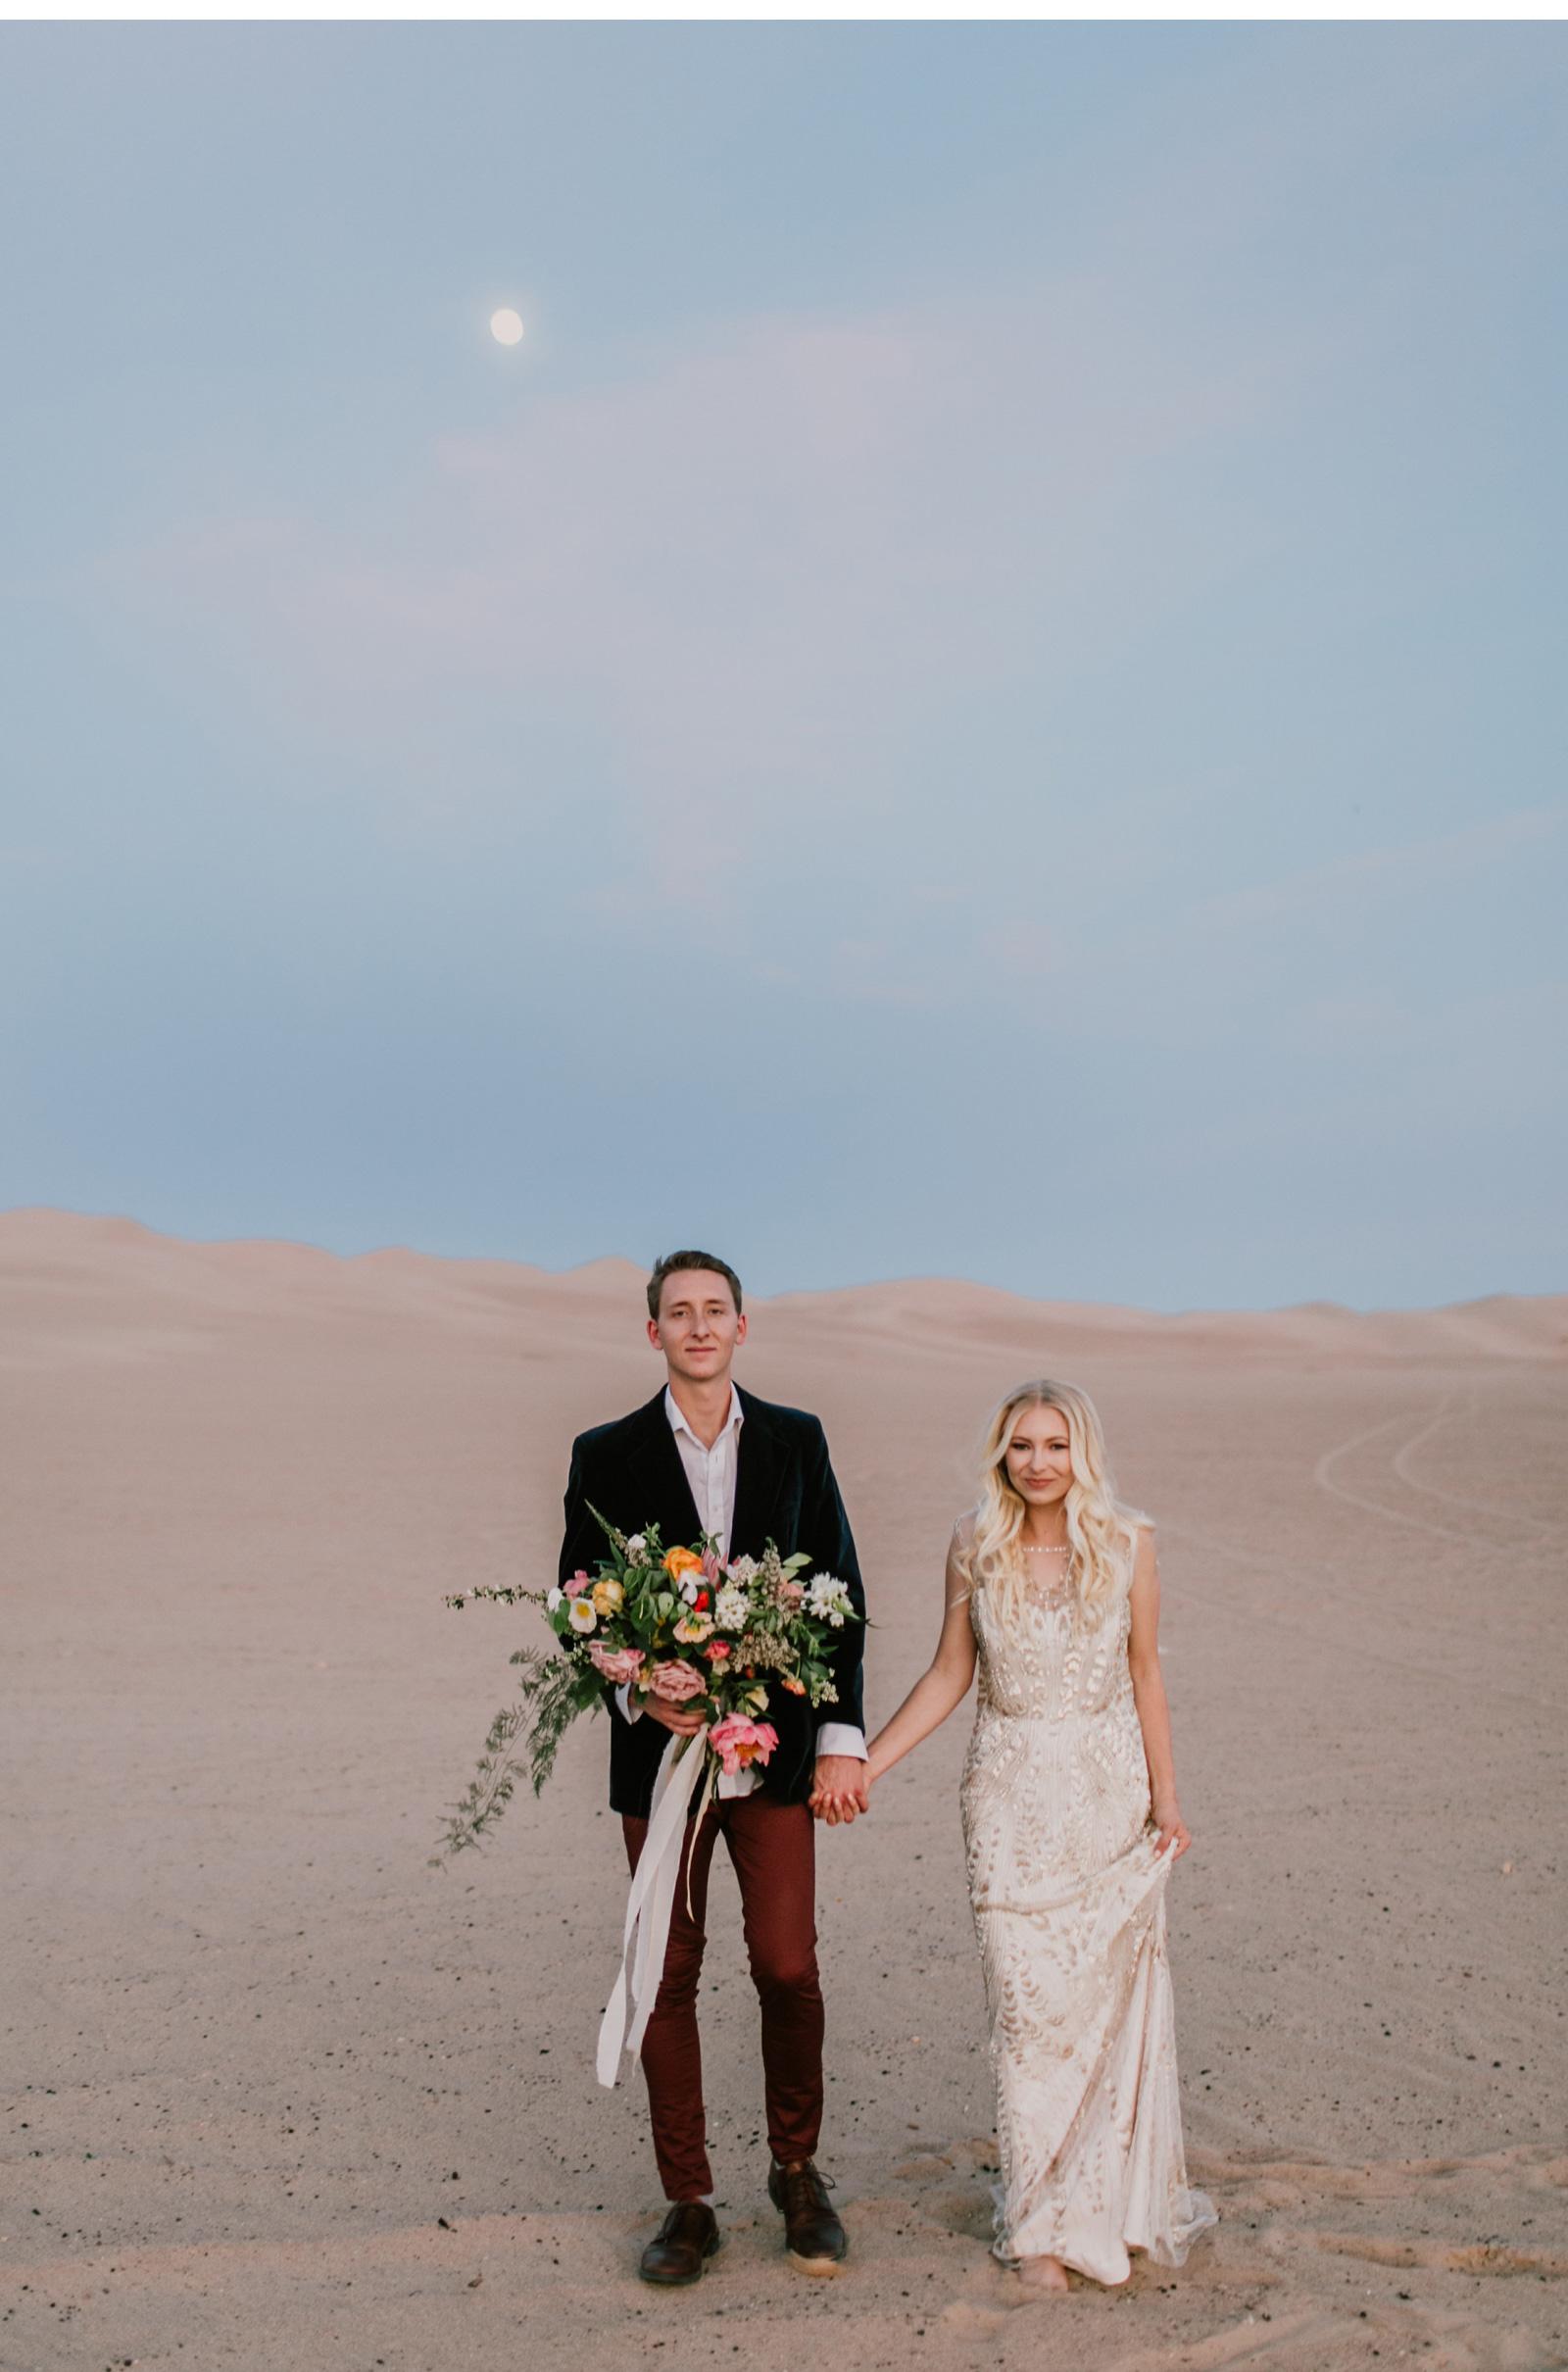 Desert-Wedding-Free-People-Wedding-Natalie-Schutt-Photography_12.jpg